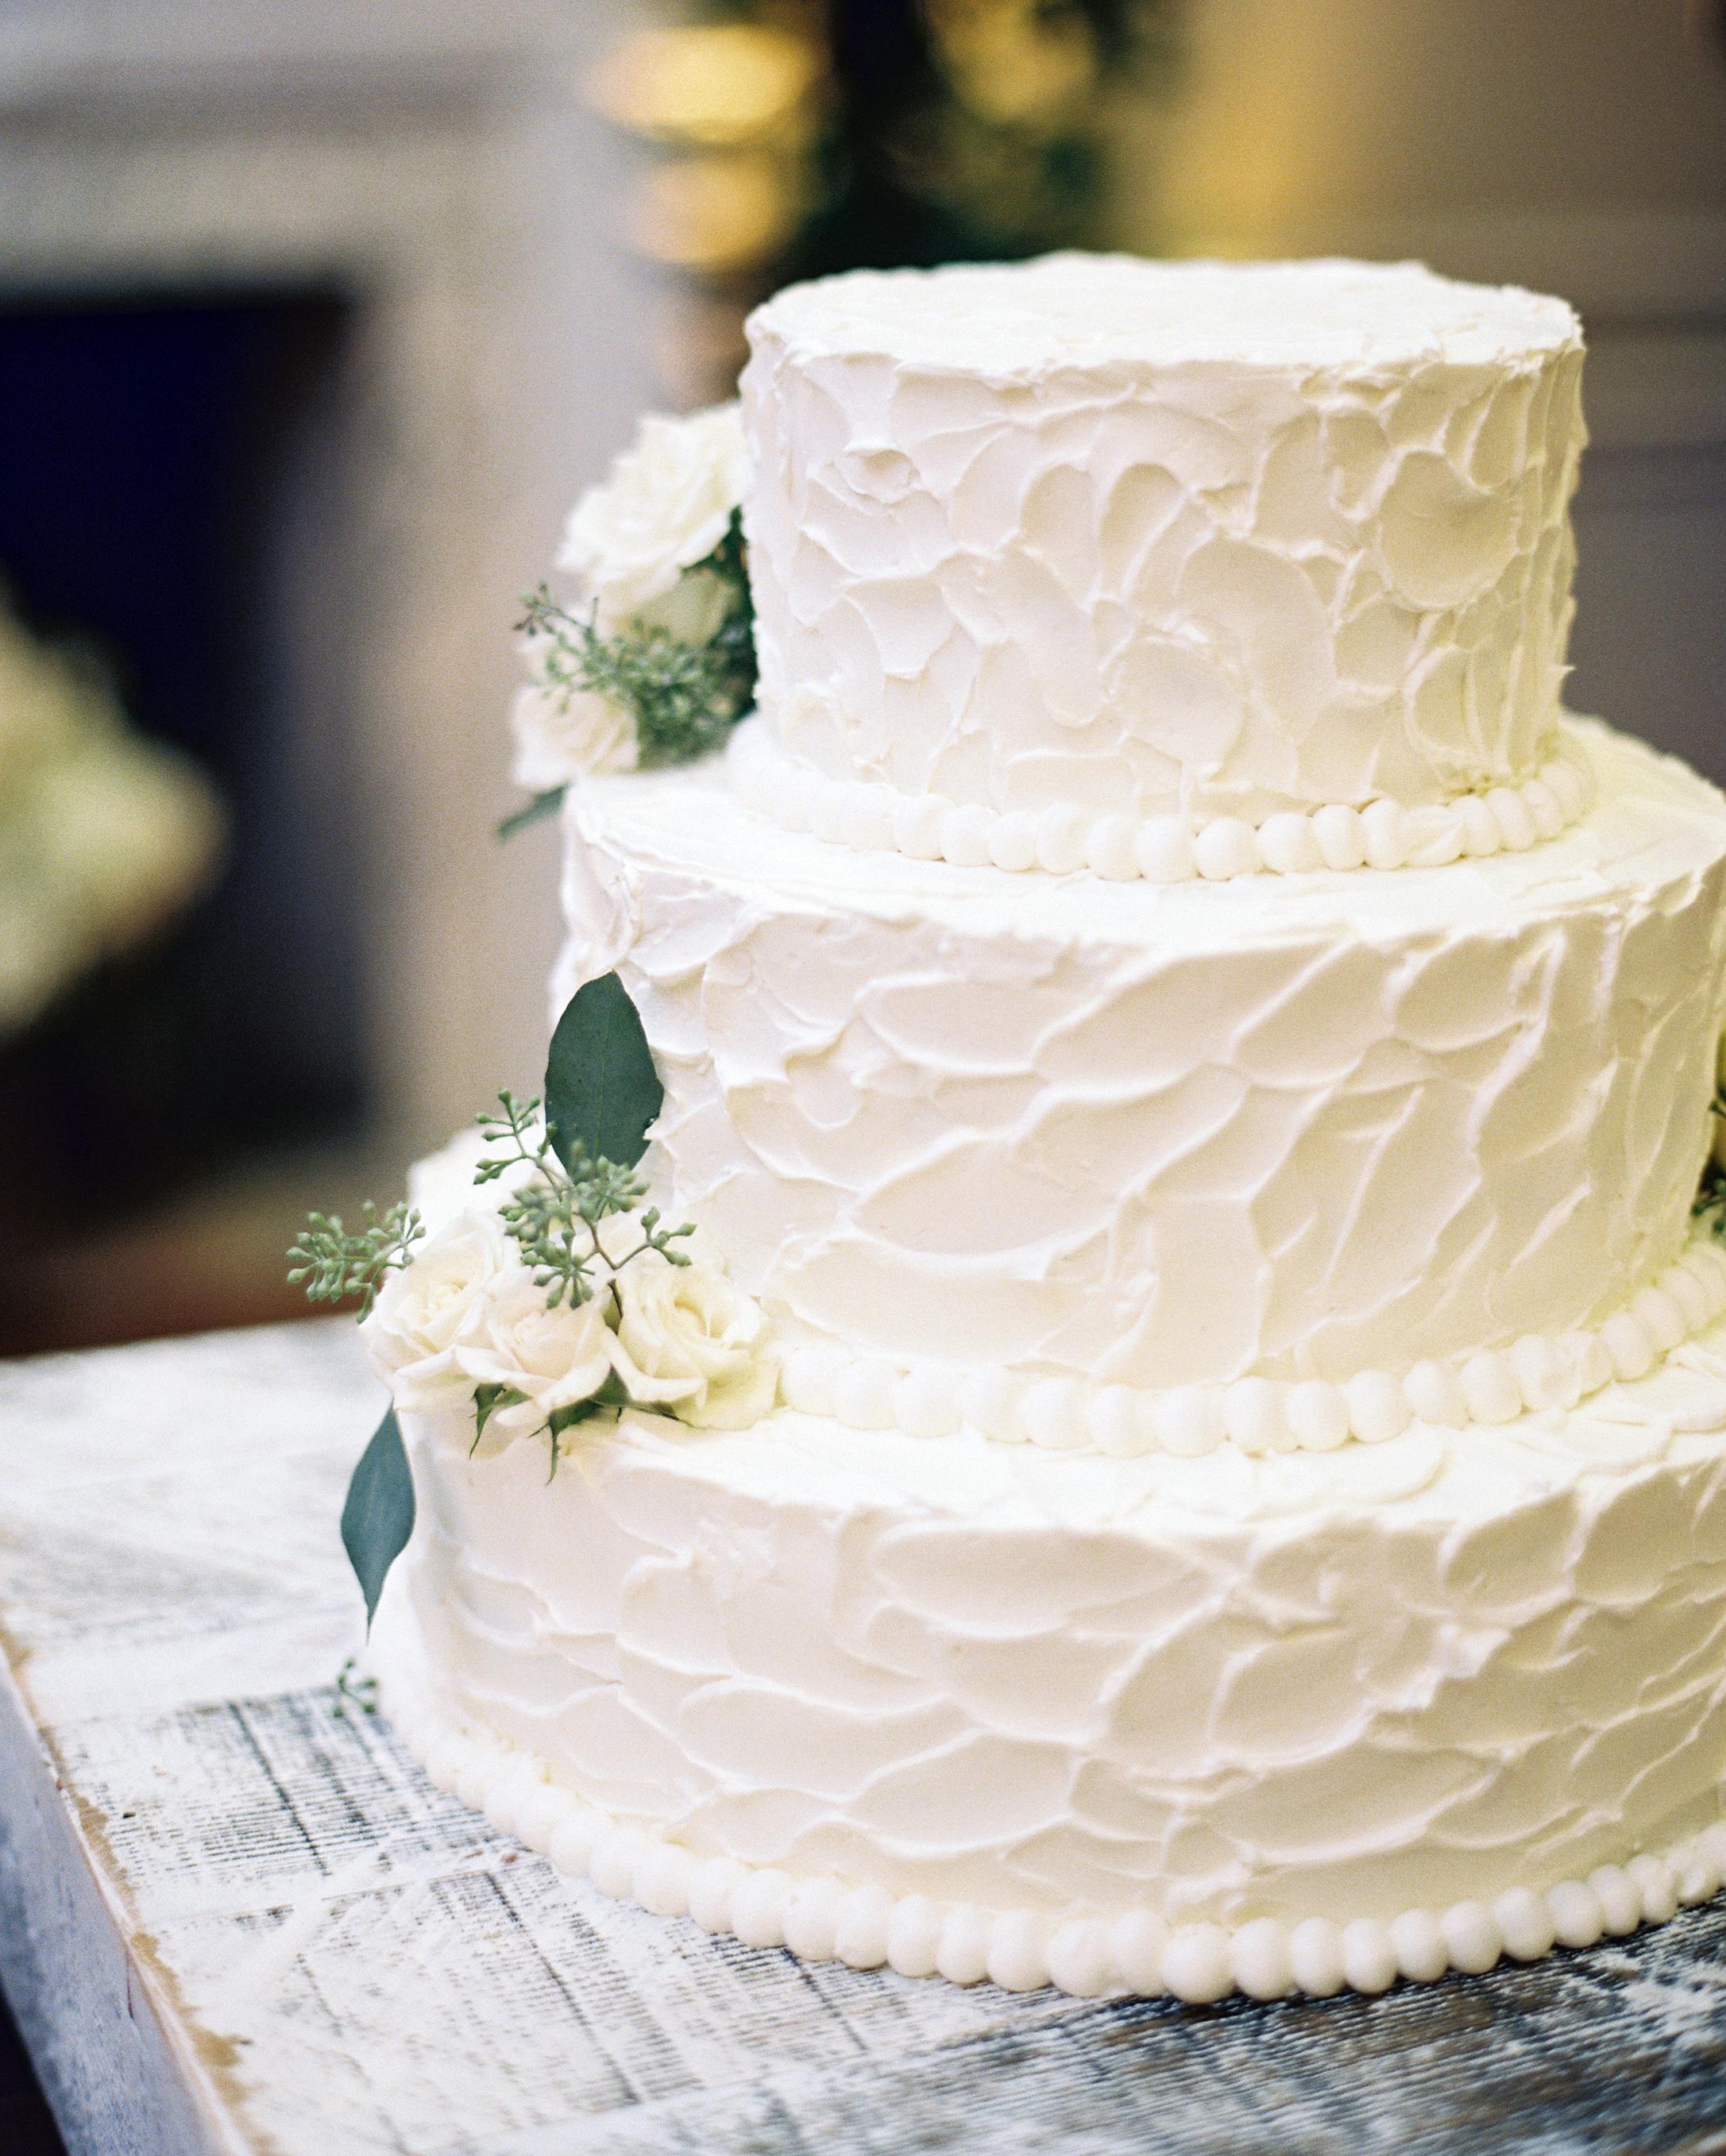 beth-scott-wedding-cake-0977-s112077-0715.jpg